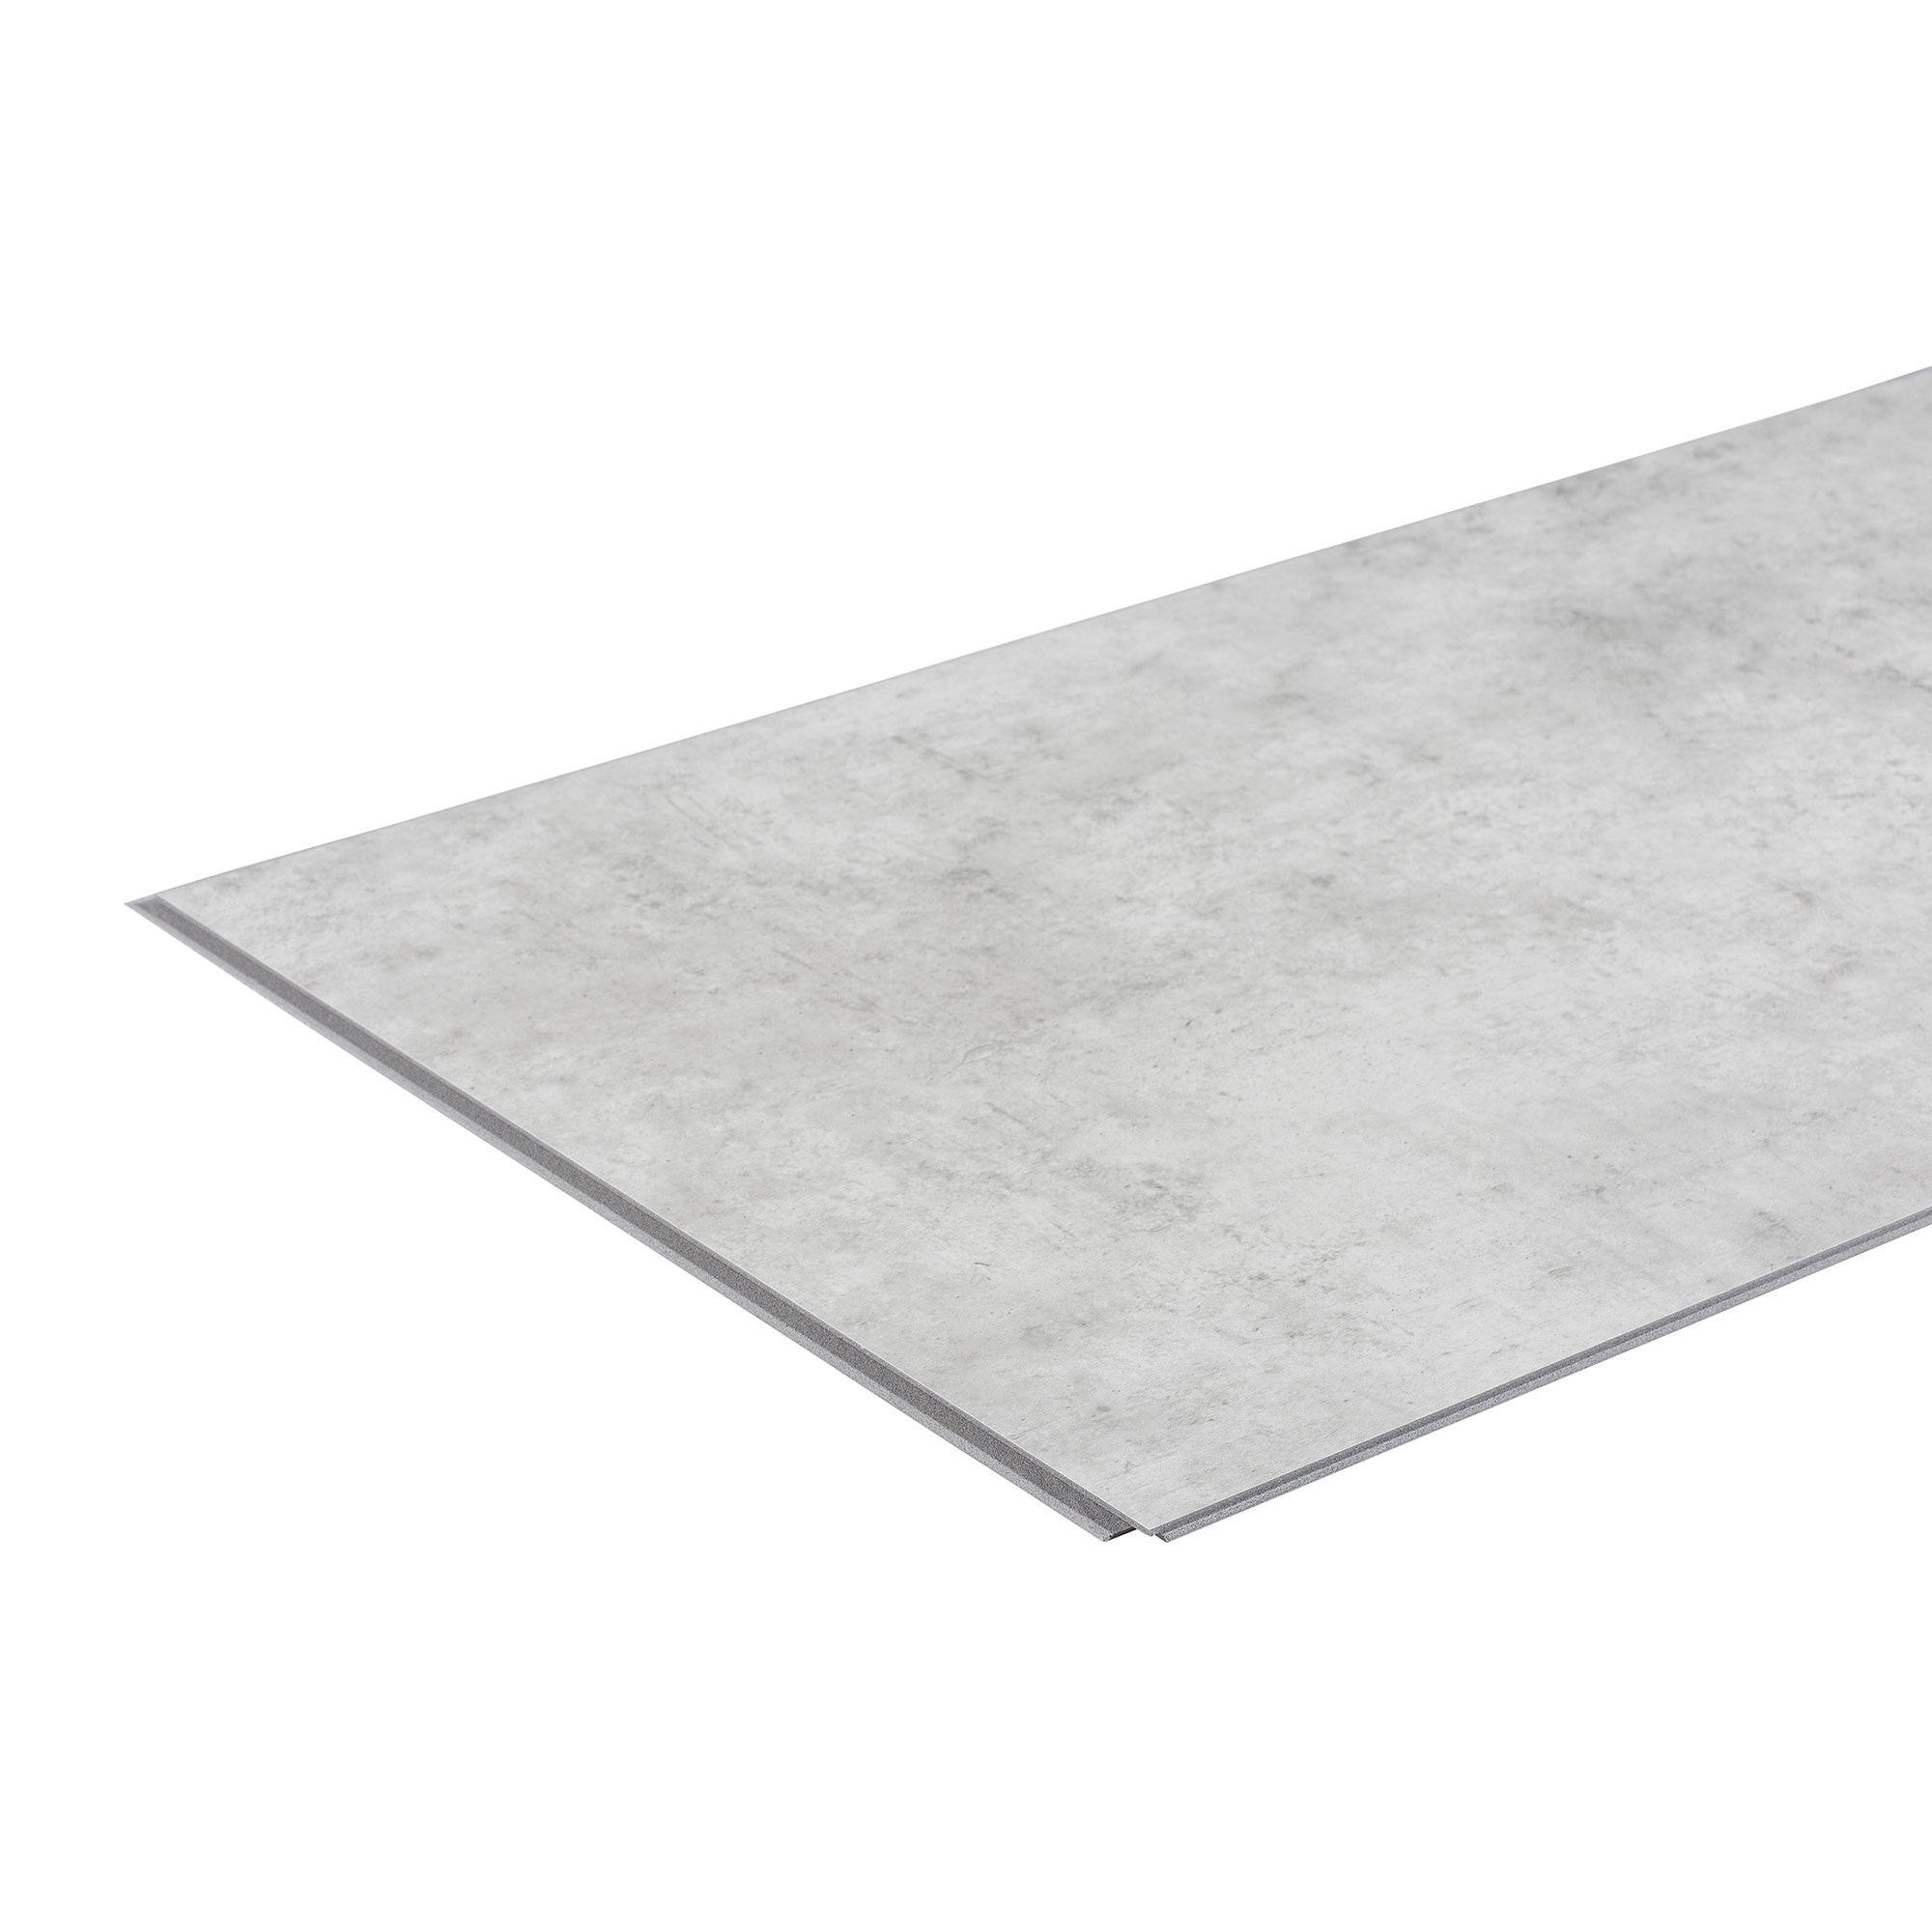 Interlocking Vinyl Wall Tile by DumaWall - Waterproof, Durable Backsplash Panels for Kitchen, Bathroom, or Shower (Frost Nickel)(Sample)